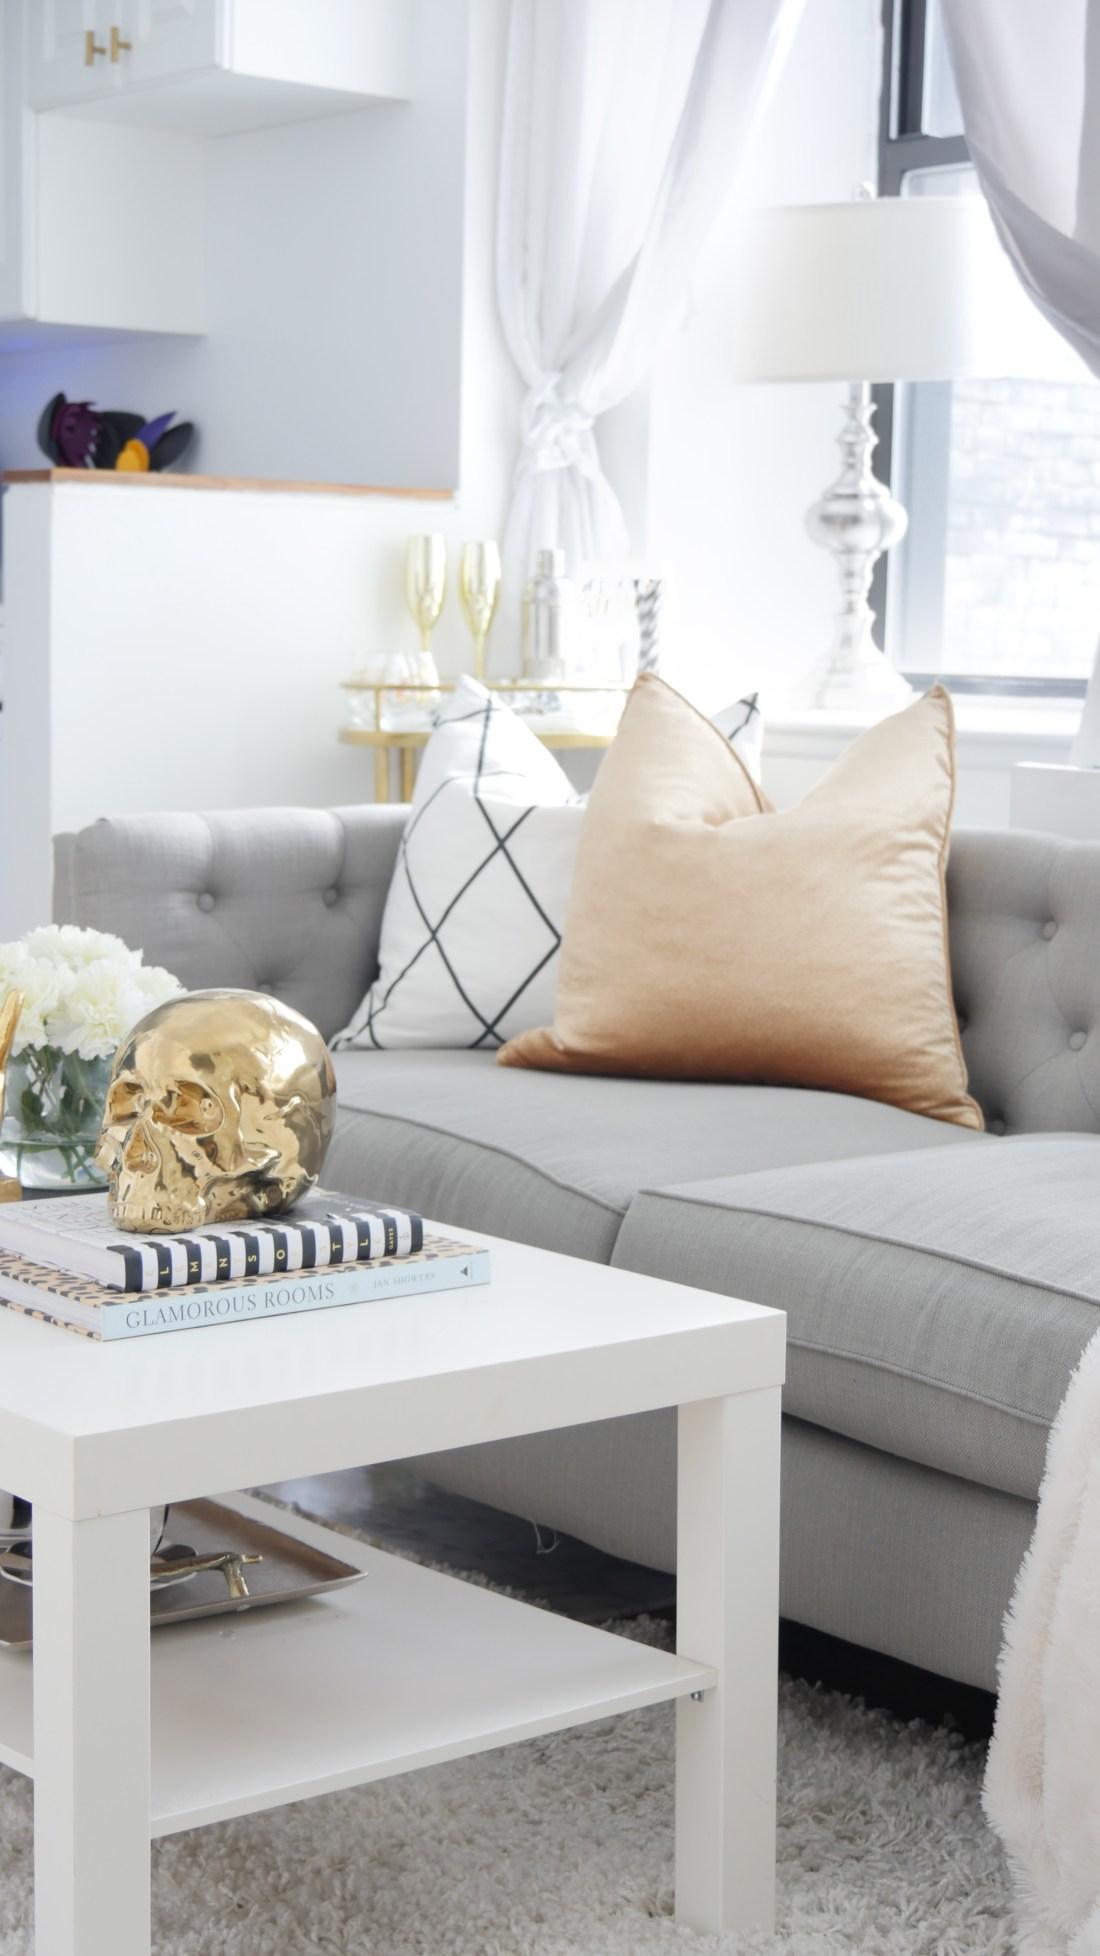 price photos design furniture transforming folding cupboard table wall desk convertible dining